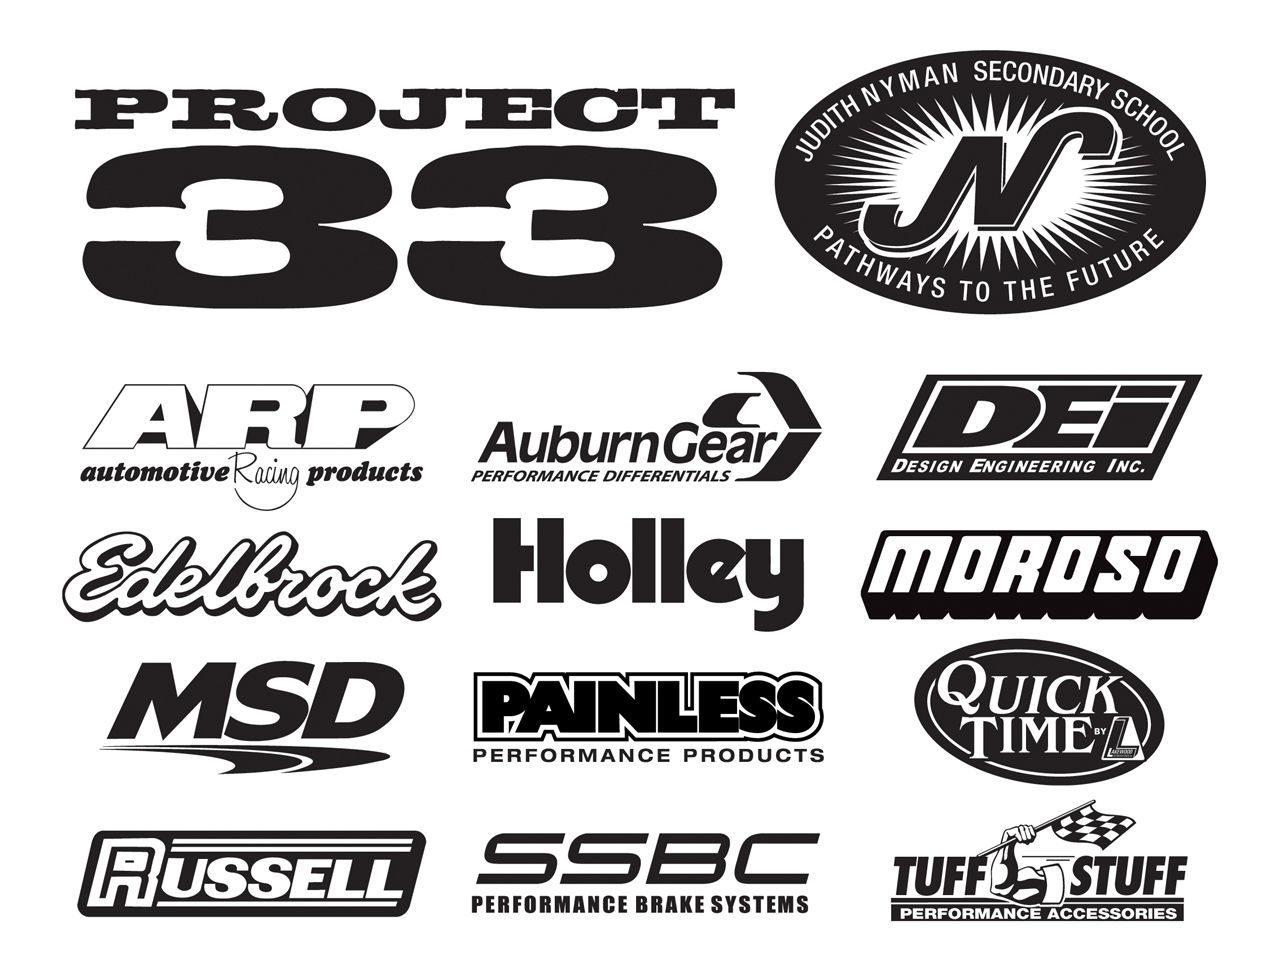 | Project 33 Sponsors